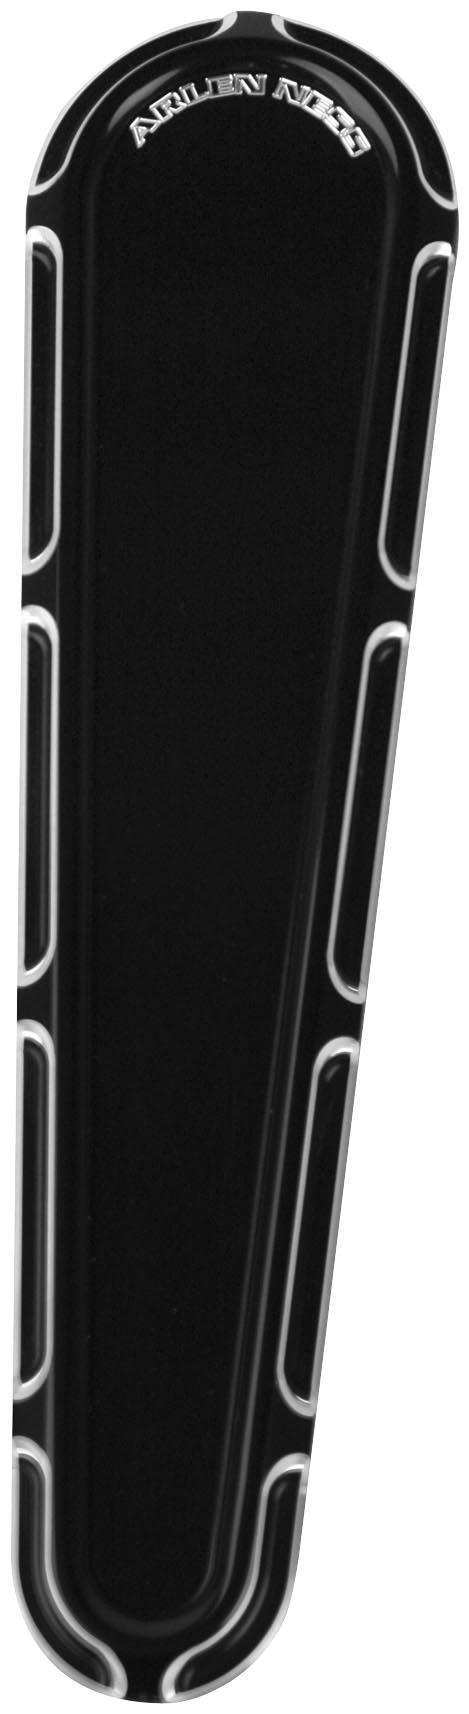 Arlen Ness 04-146 Black Billet Dash Insert